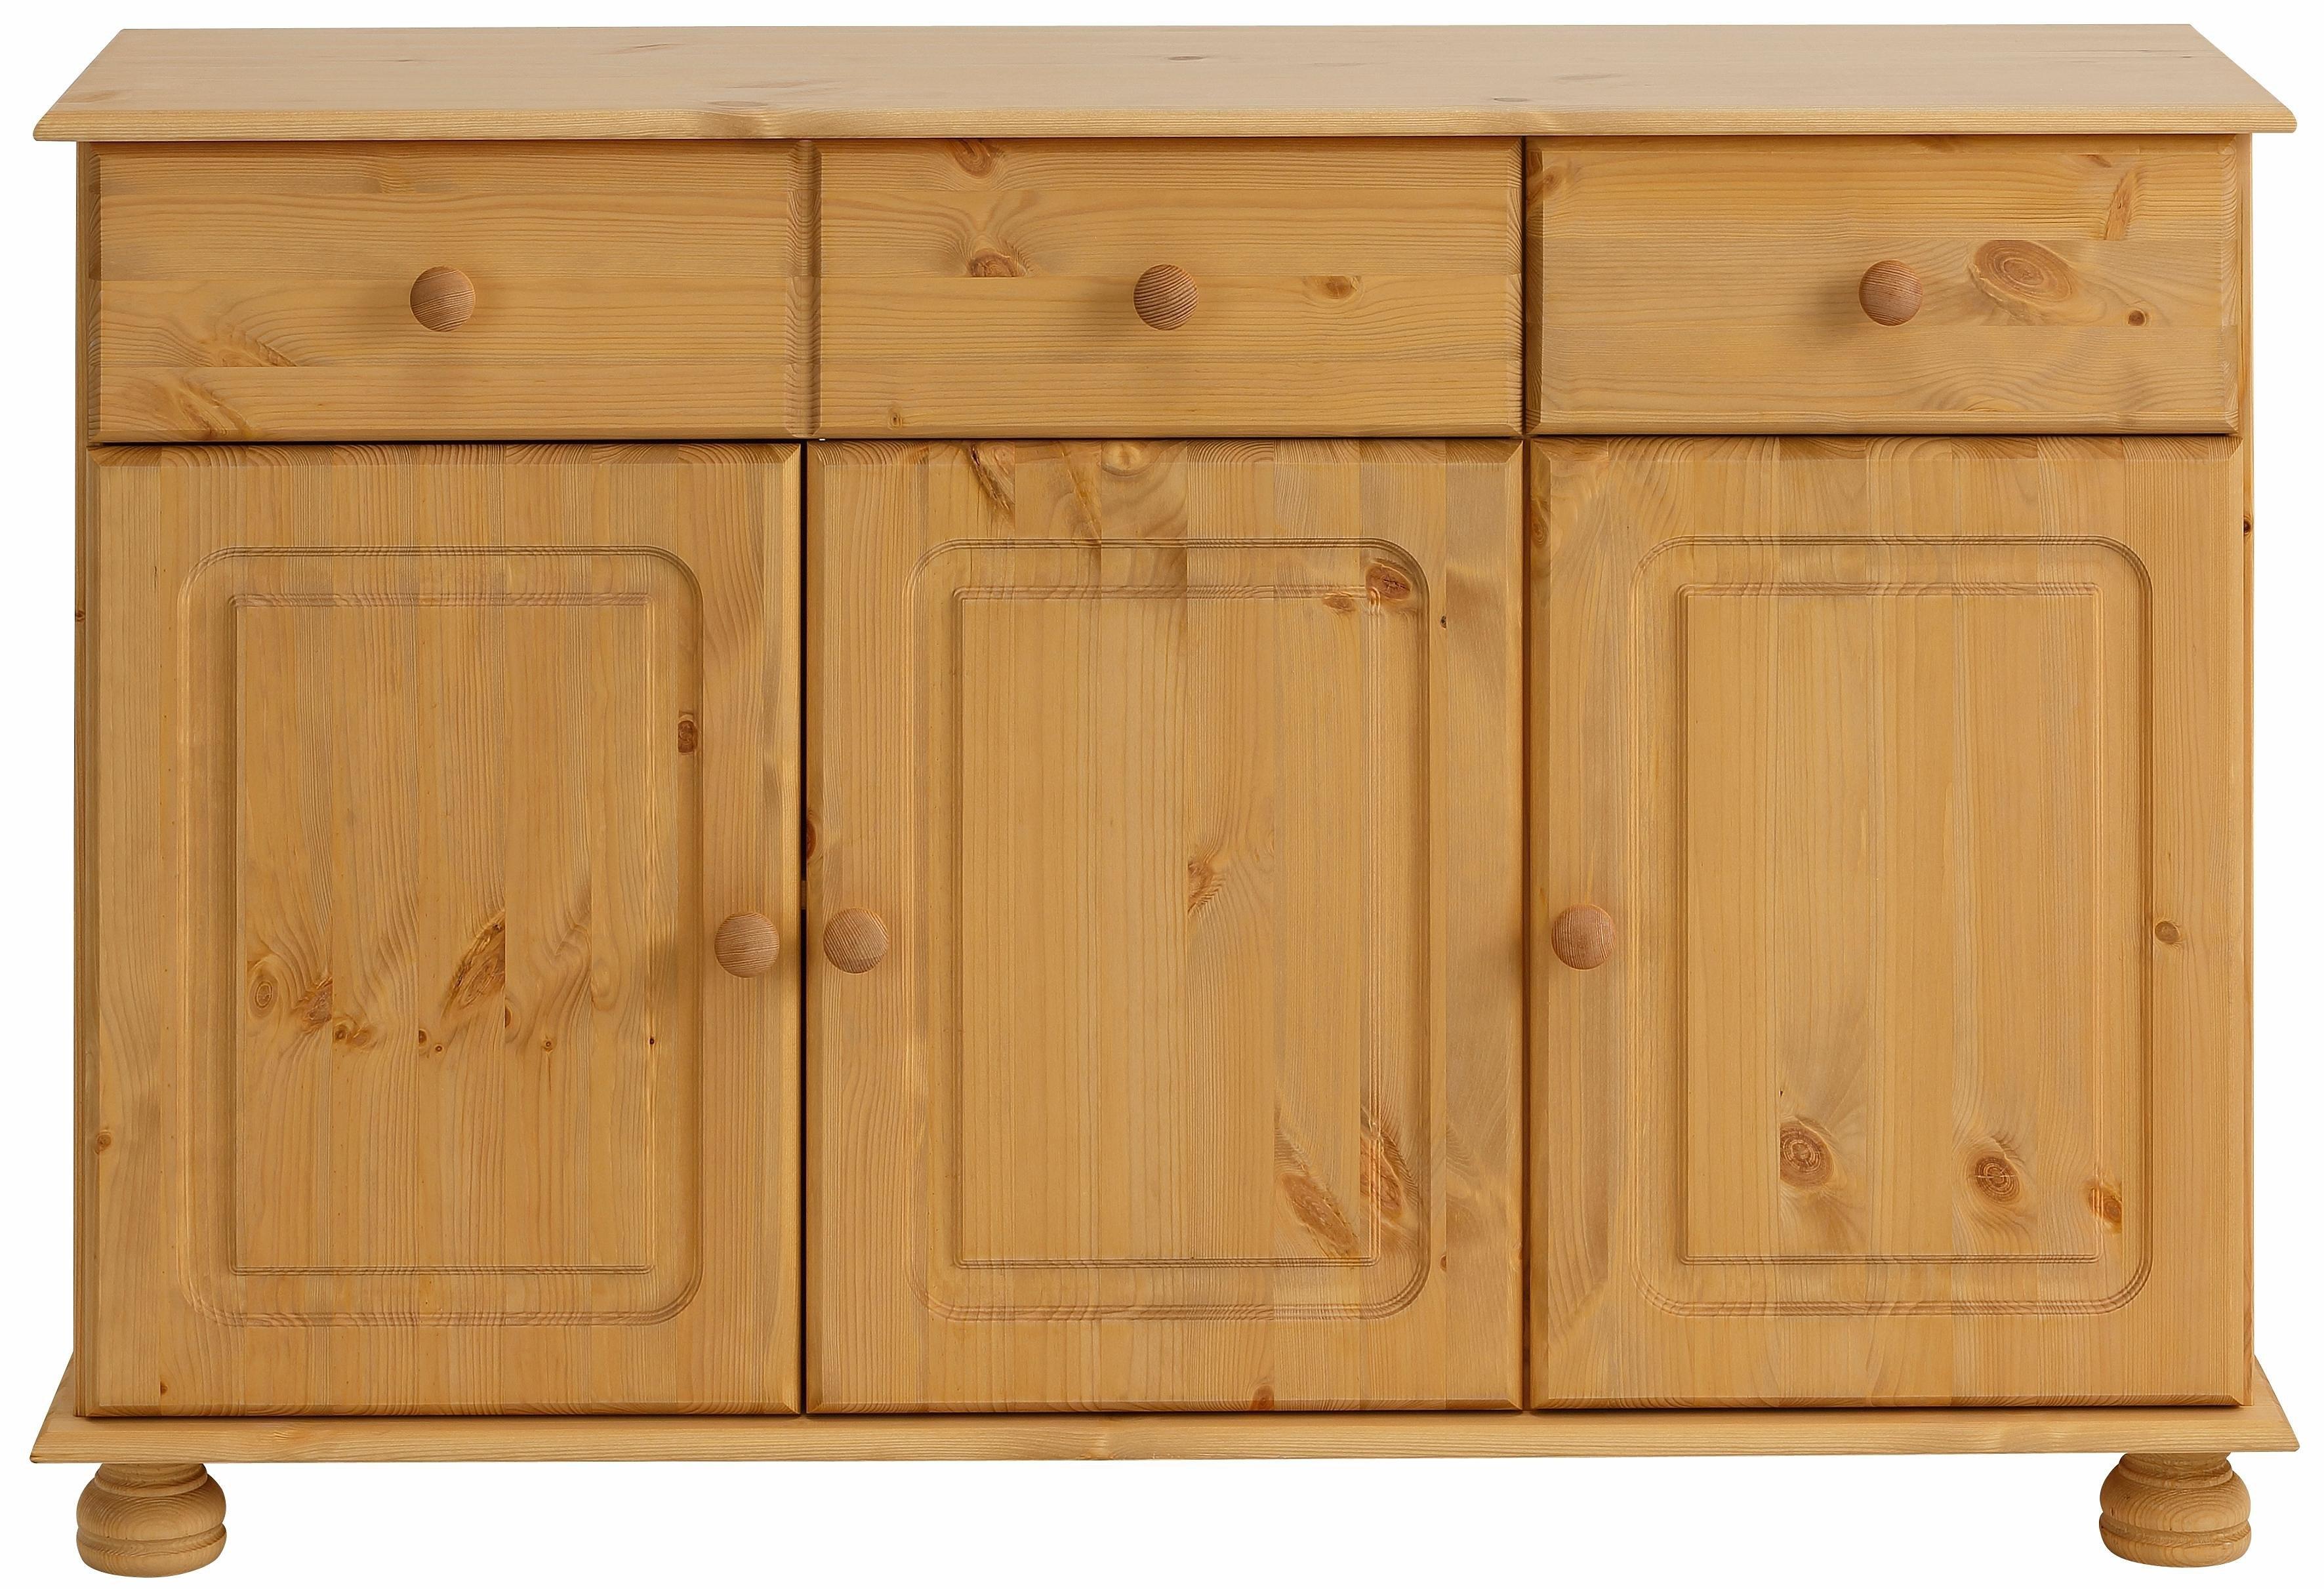 Home affaire sideboard »Mette«, breedte 120 cm nu online bestellen